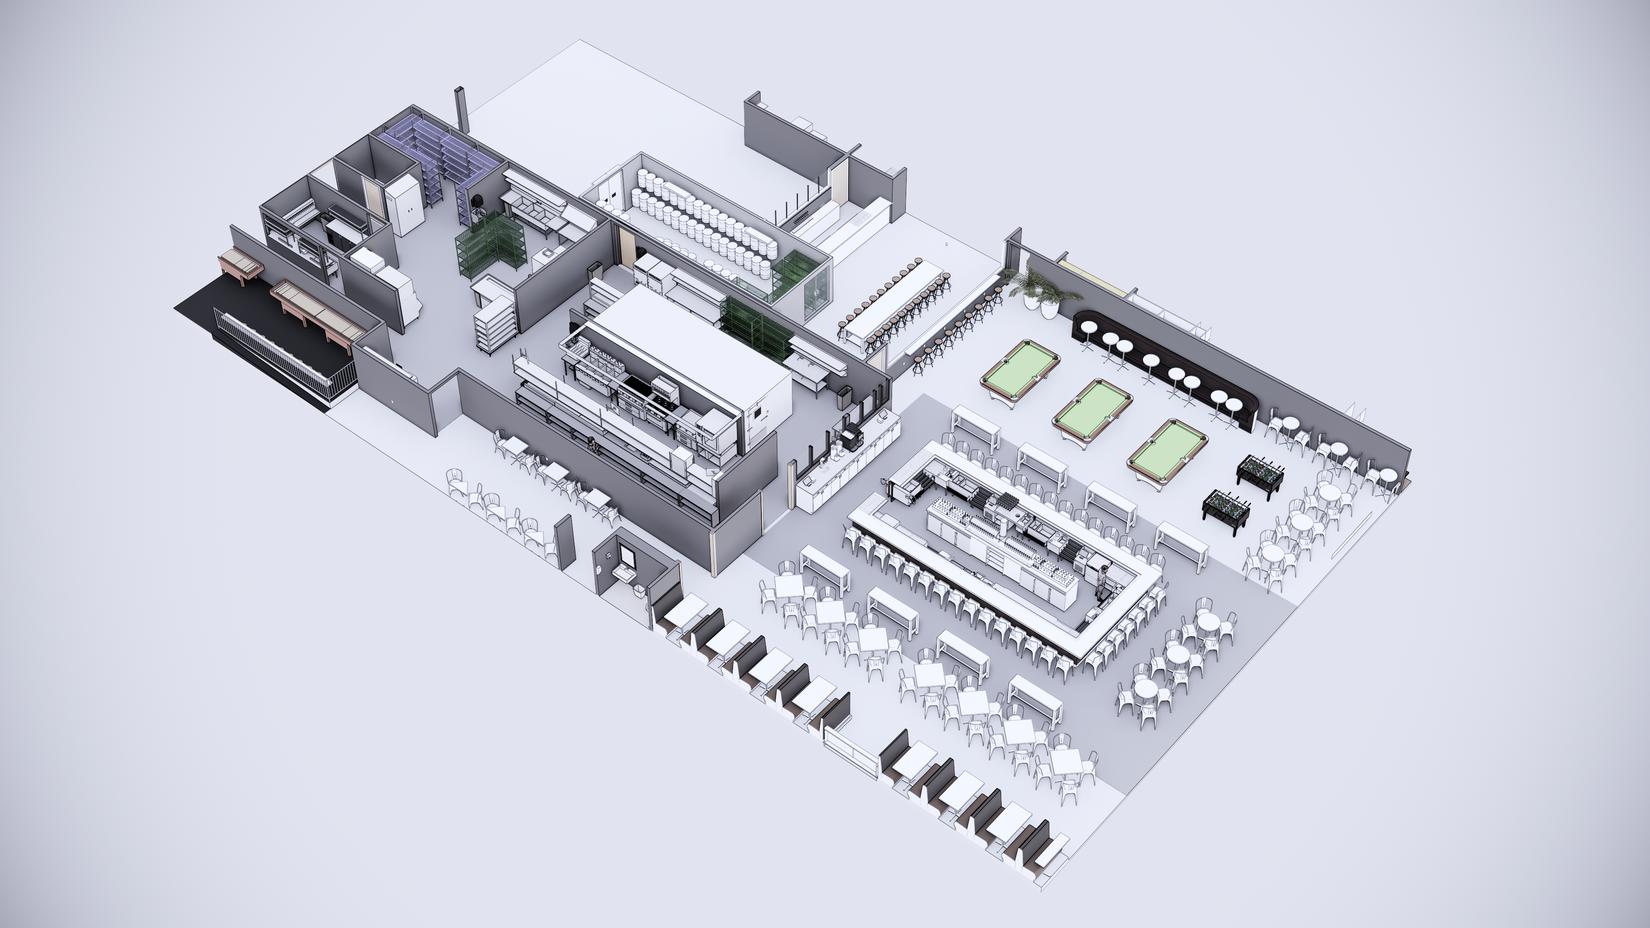 GPub 3 dimensional isometric blueprint rendering